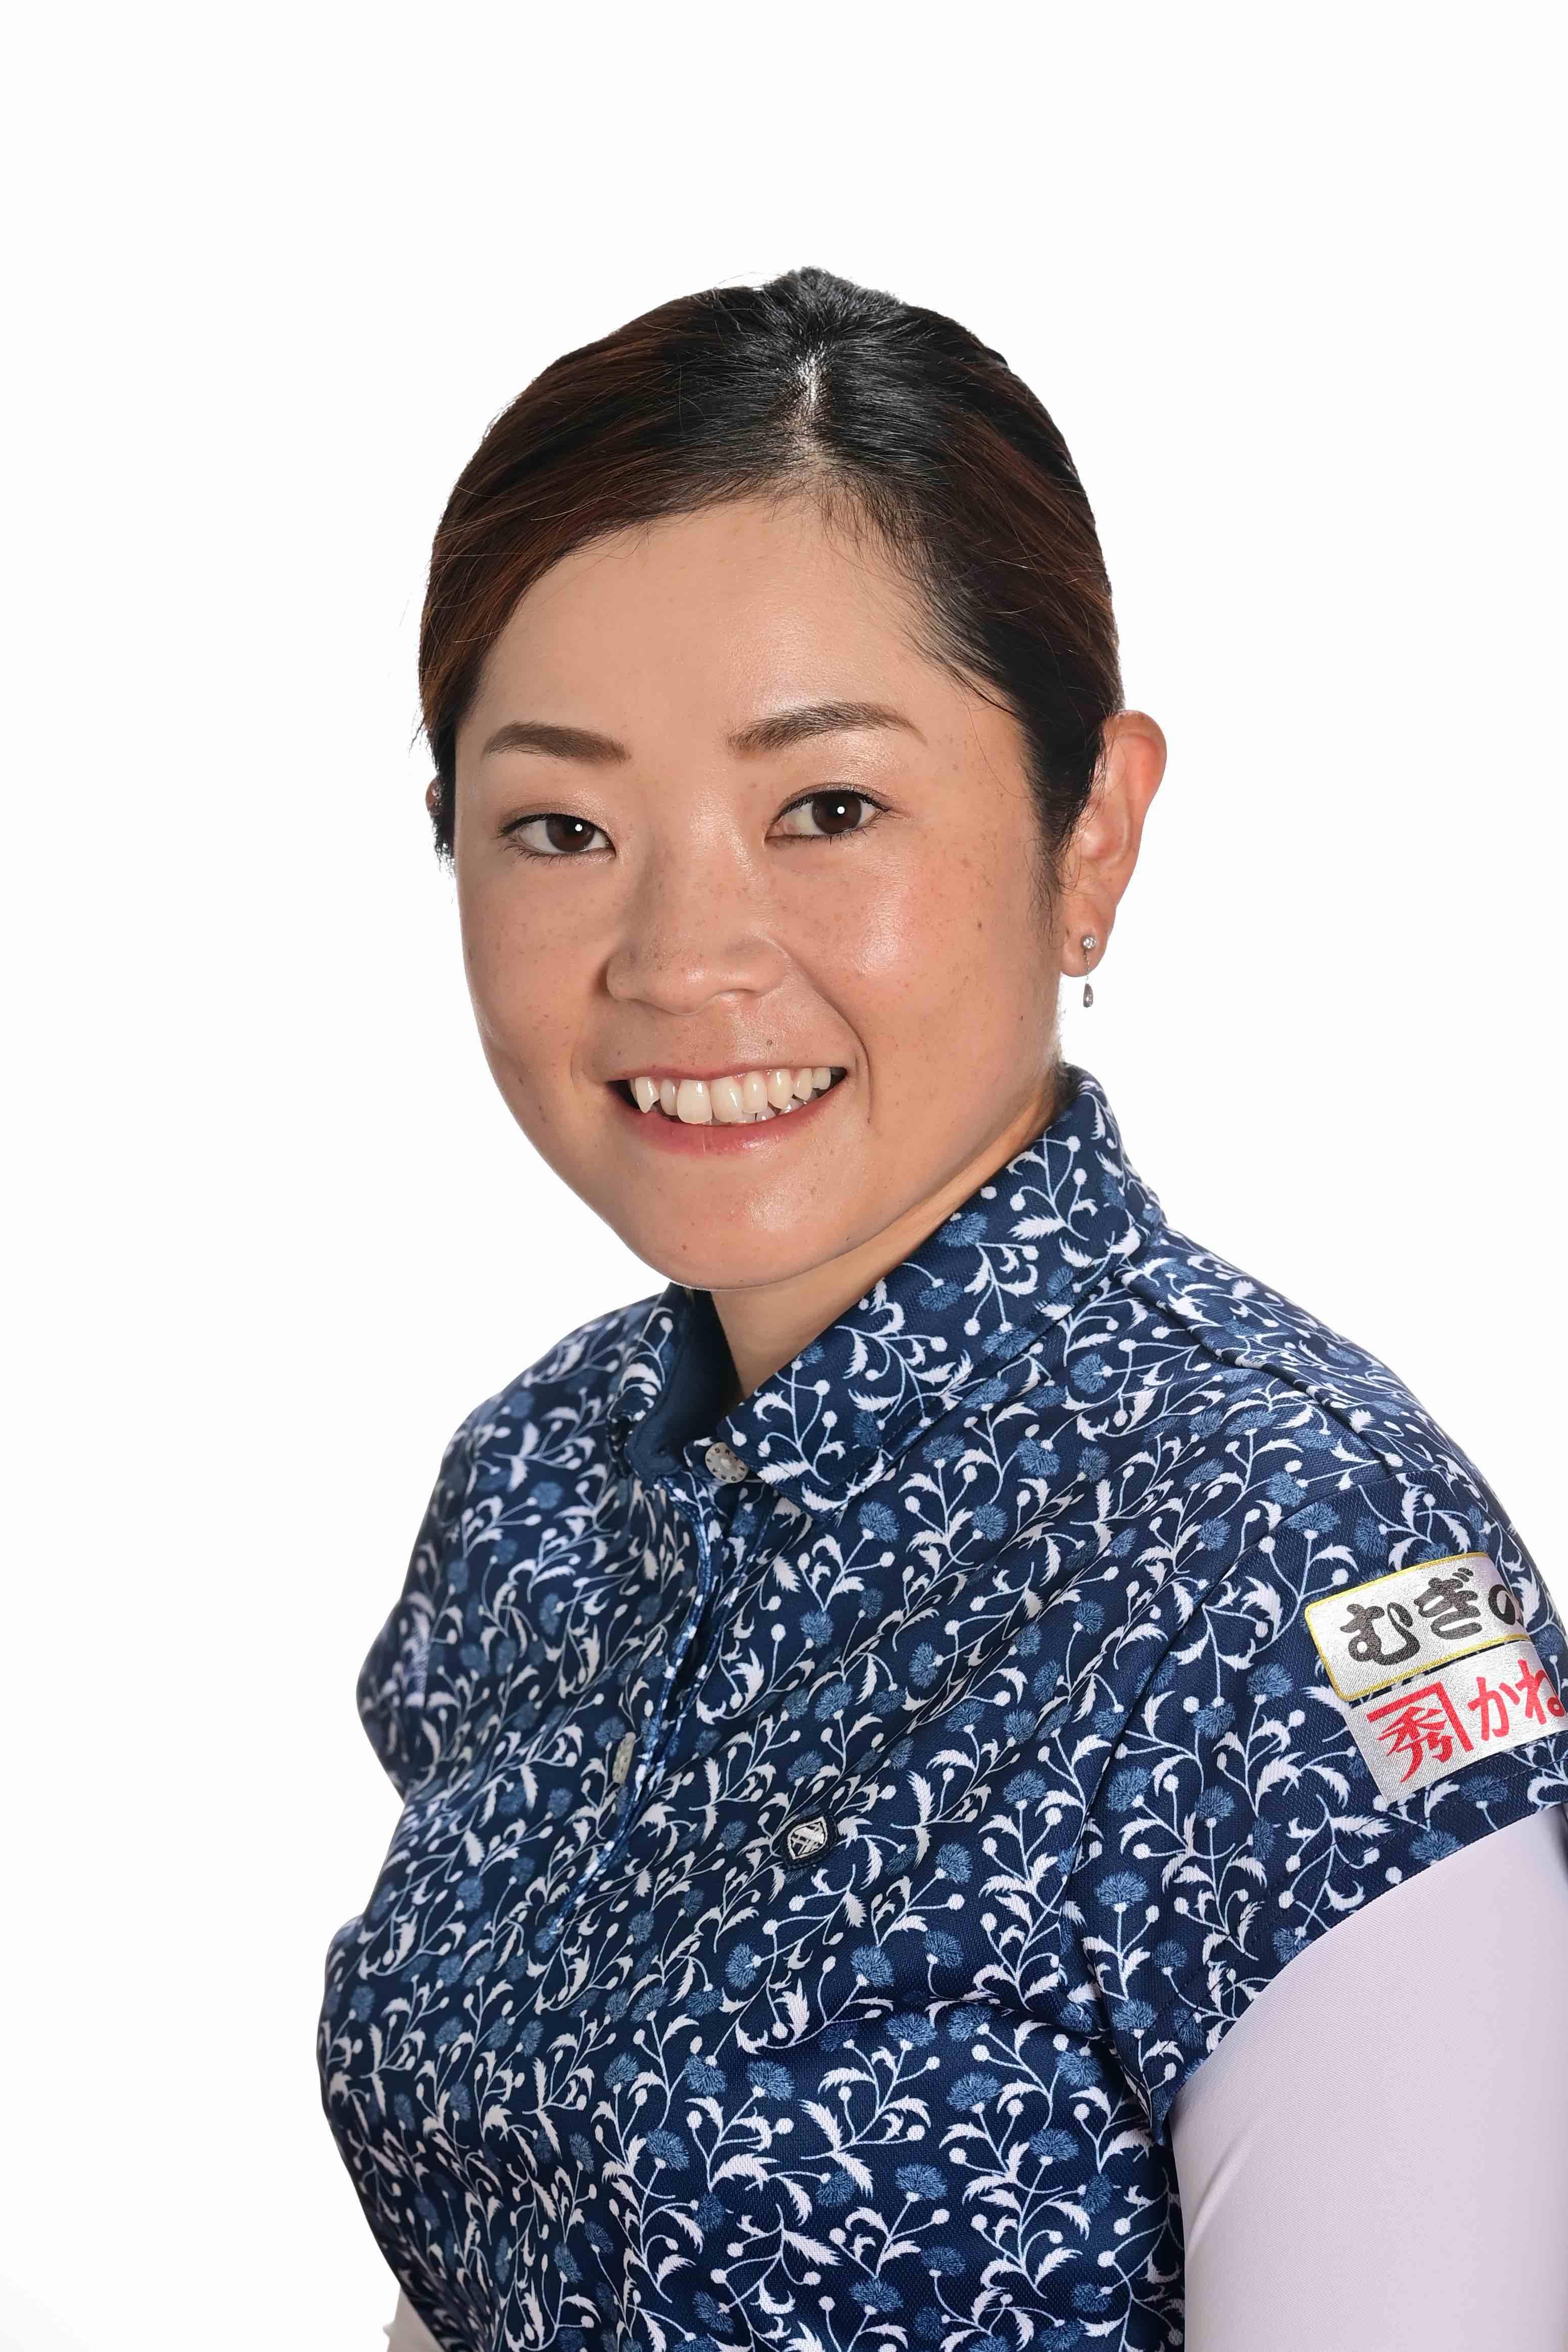 【JLPGA公式】仲宗根 澄香 選手(ゴルフボール1スリーブ③)